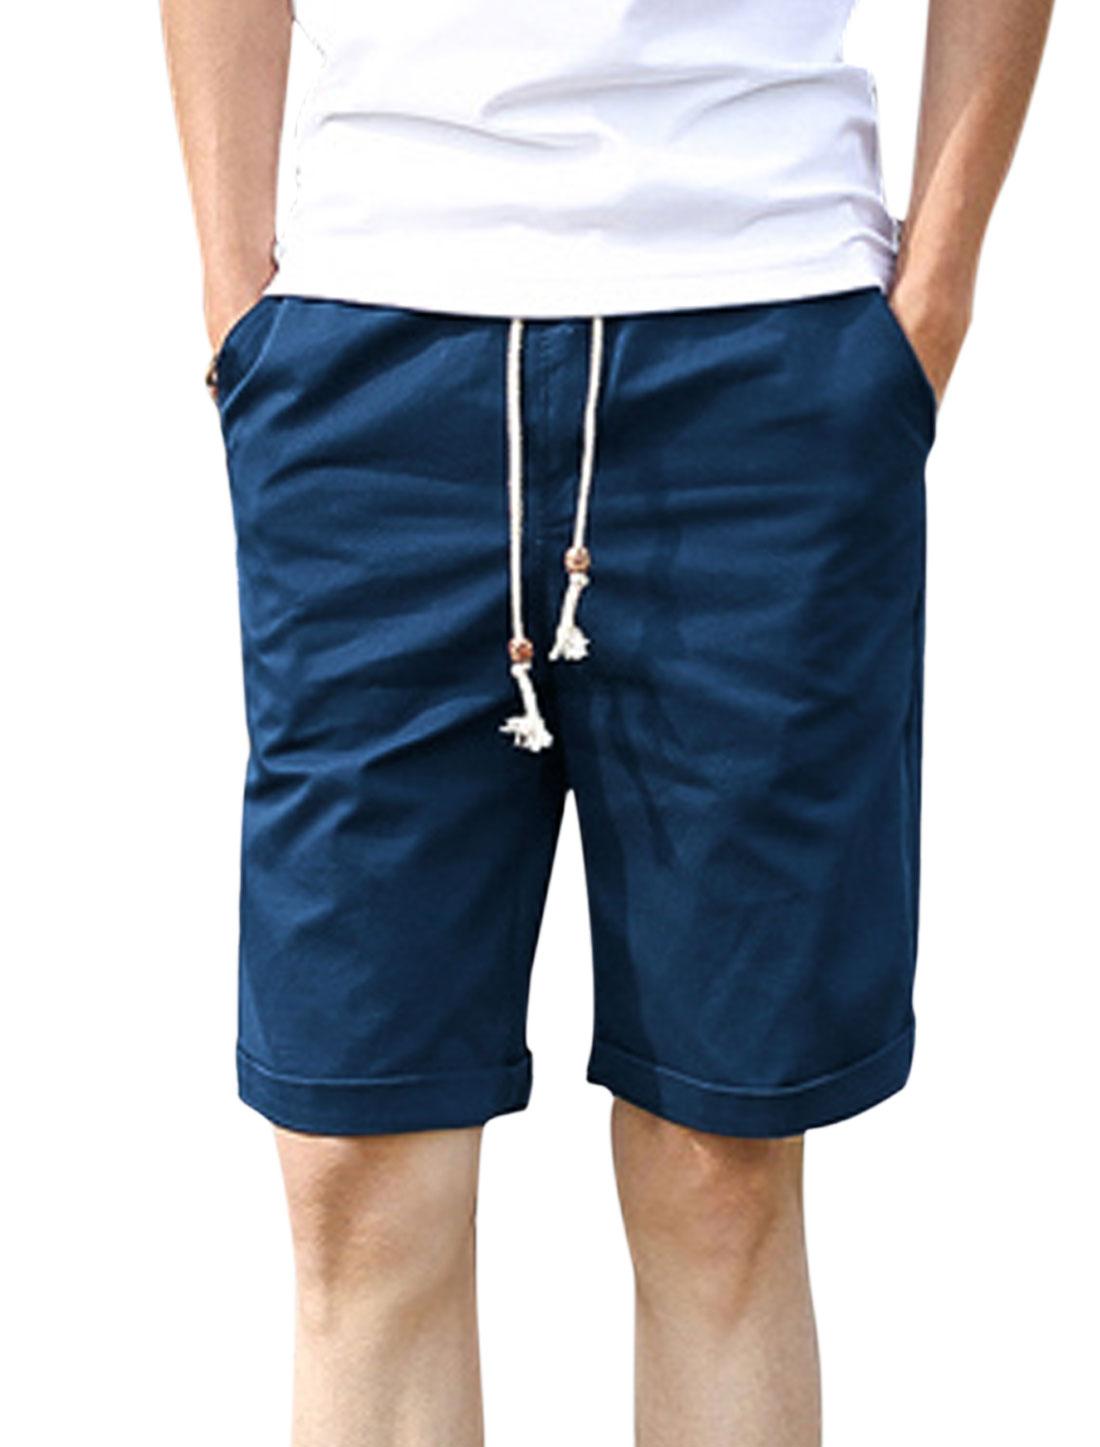 Men Elastic Waist Drawstring Front Pockets Casual Shorts Navy Blue W30